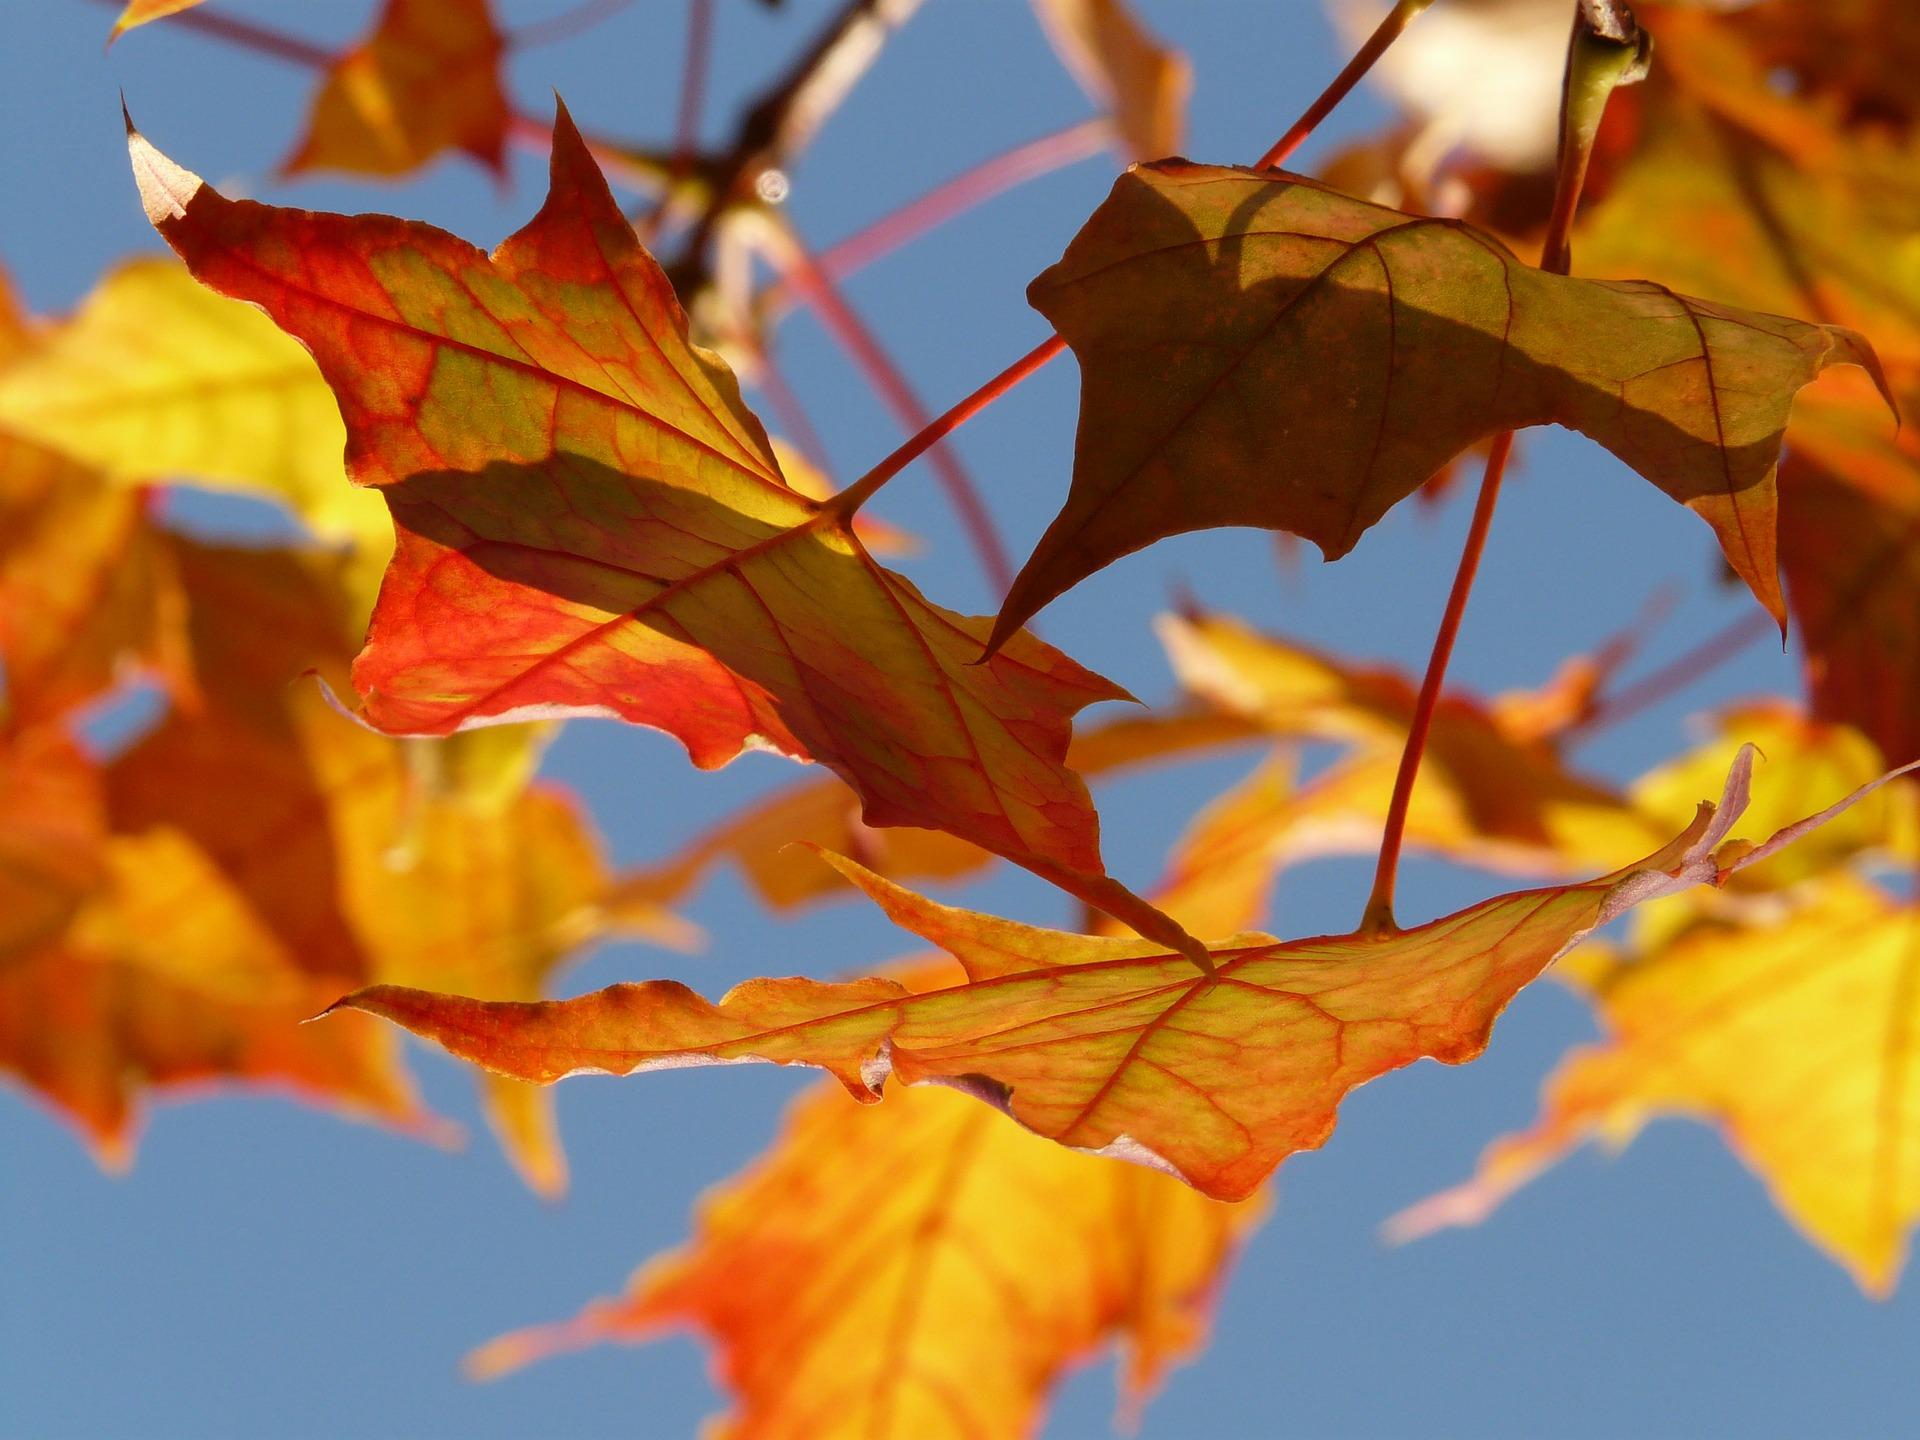 The Falling Leaf Pattern